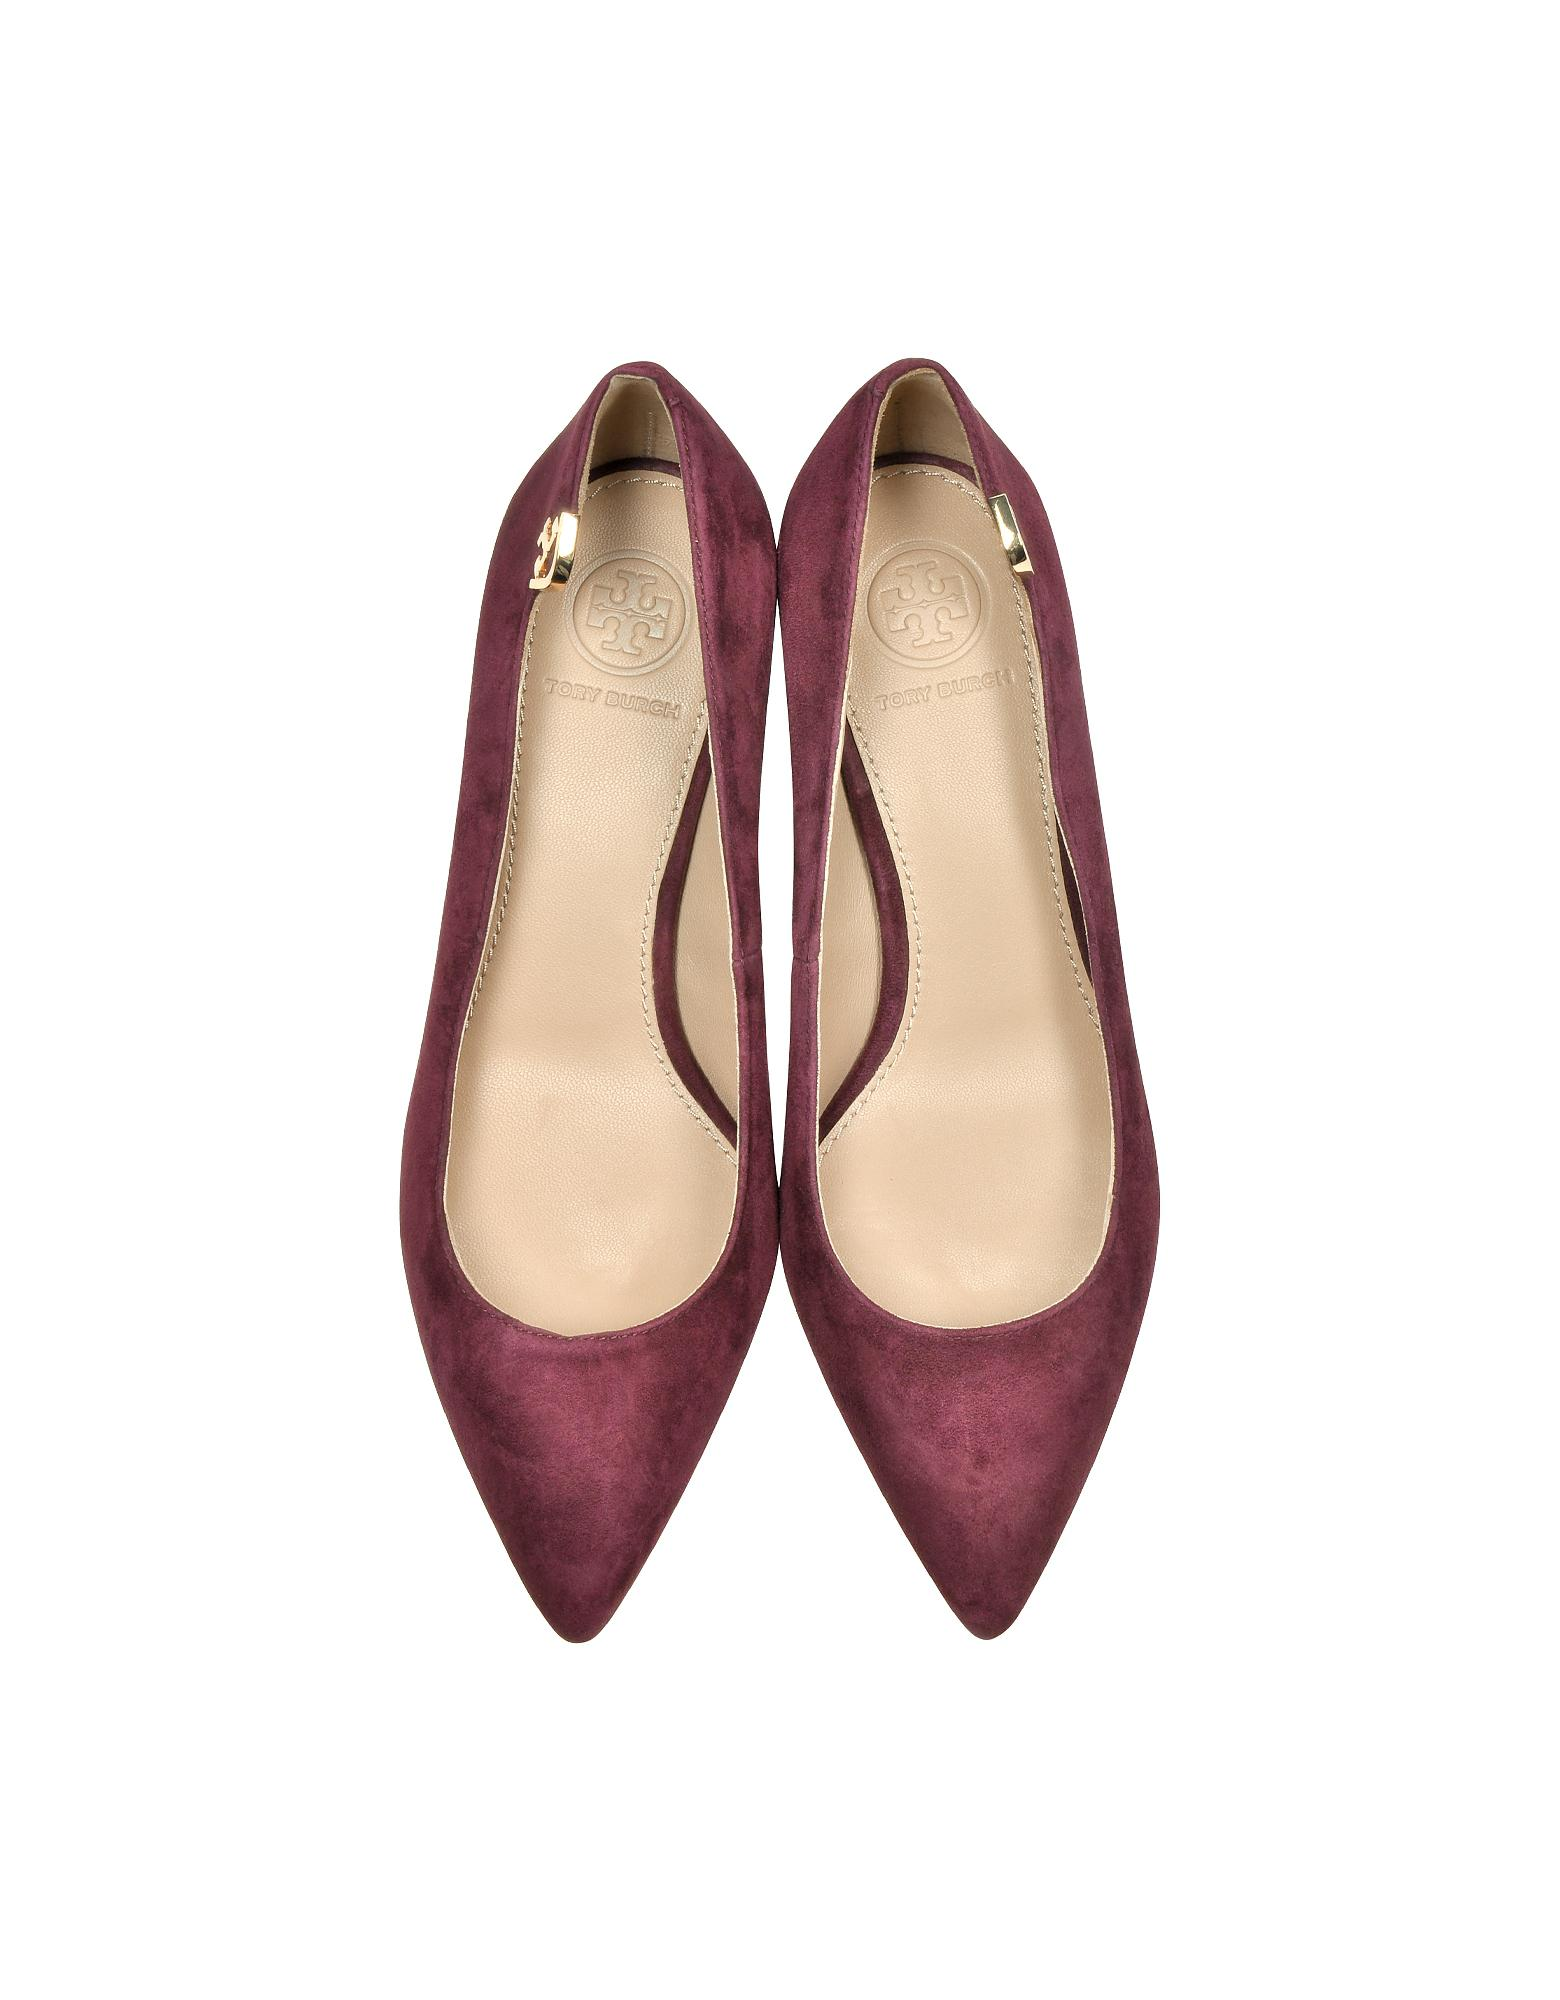 28a542f952d Tory Burch Elizabeth Burgundy Suede Mi-heel Pumps in Purple - Lyst